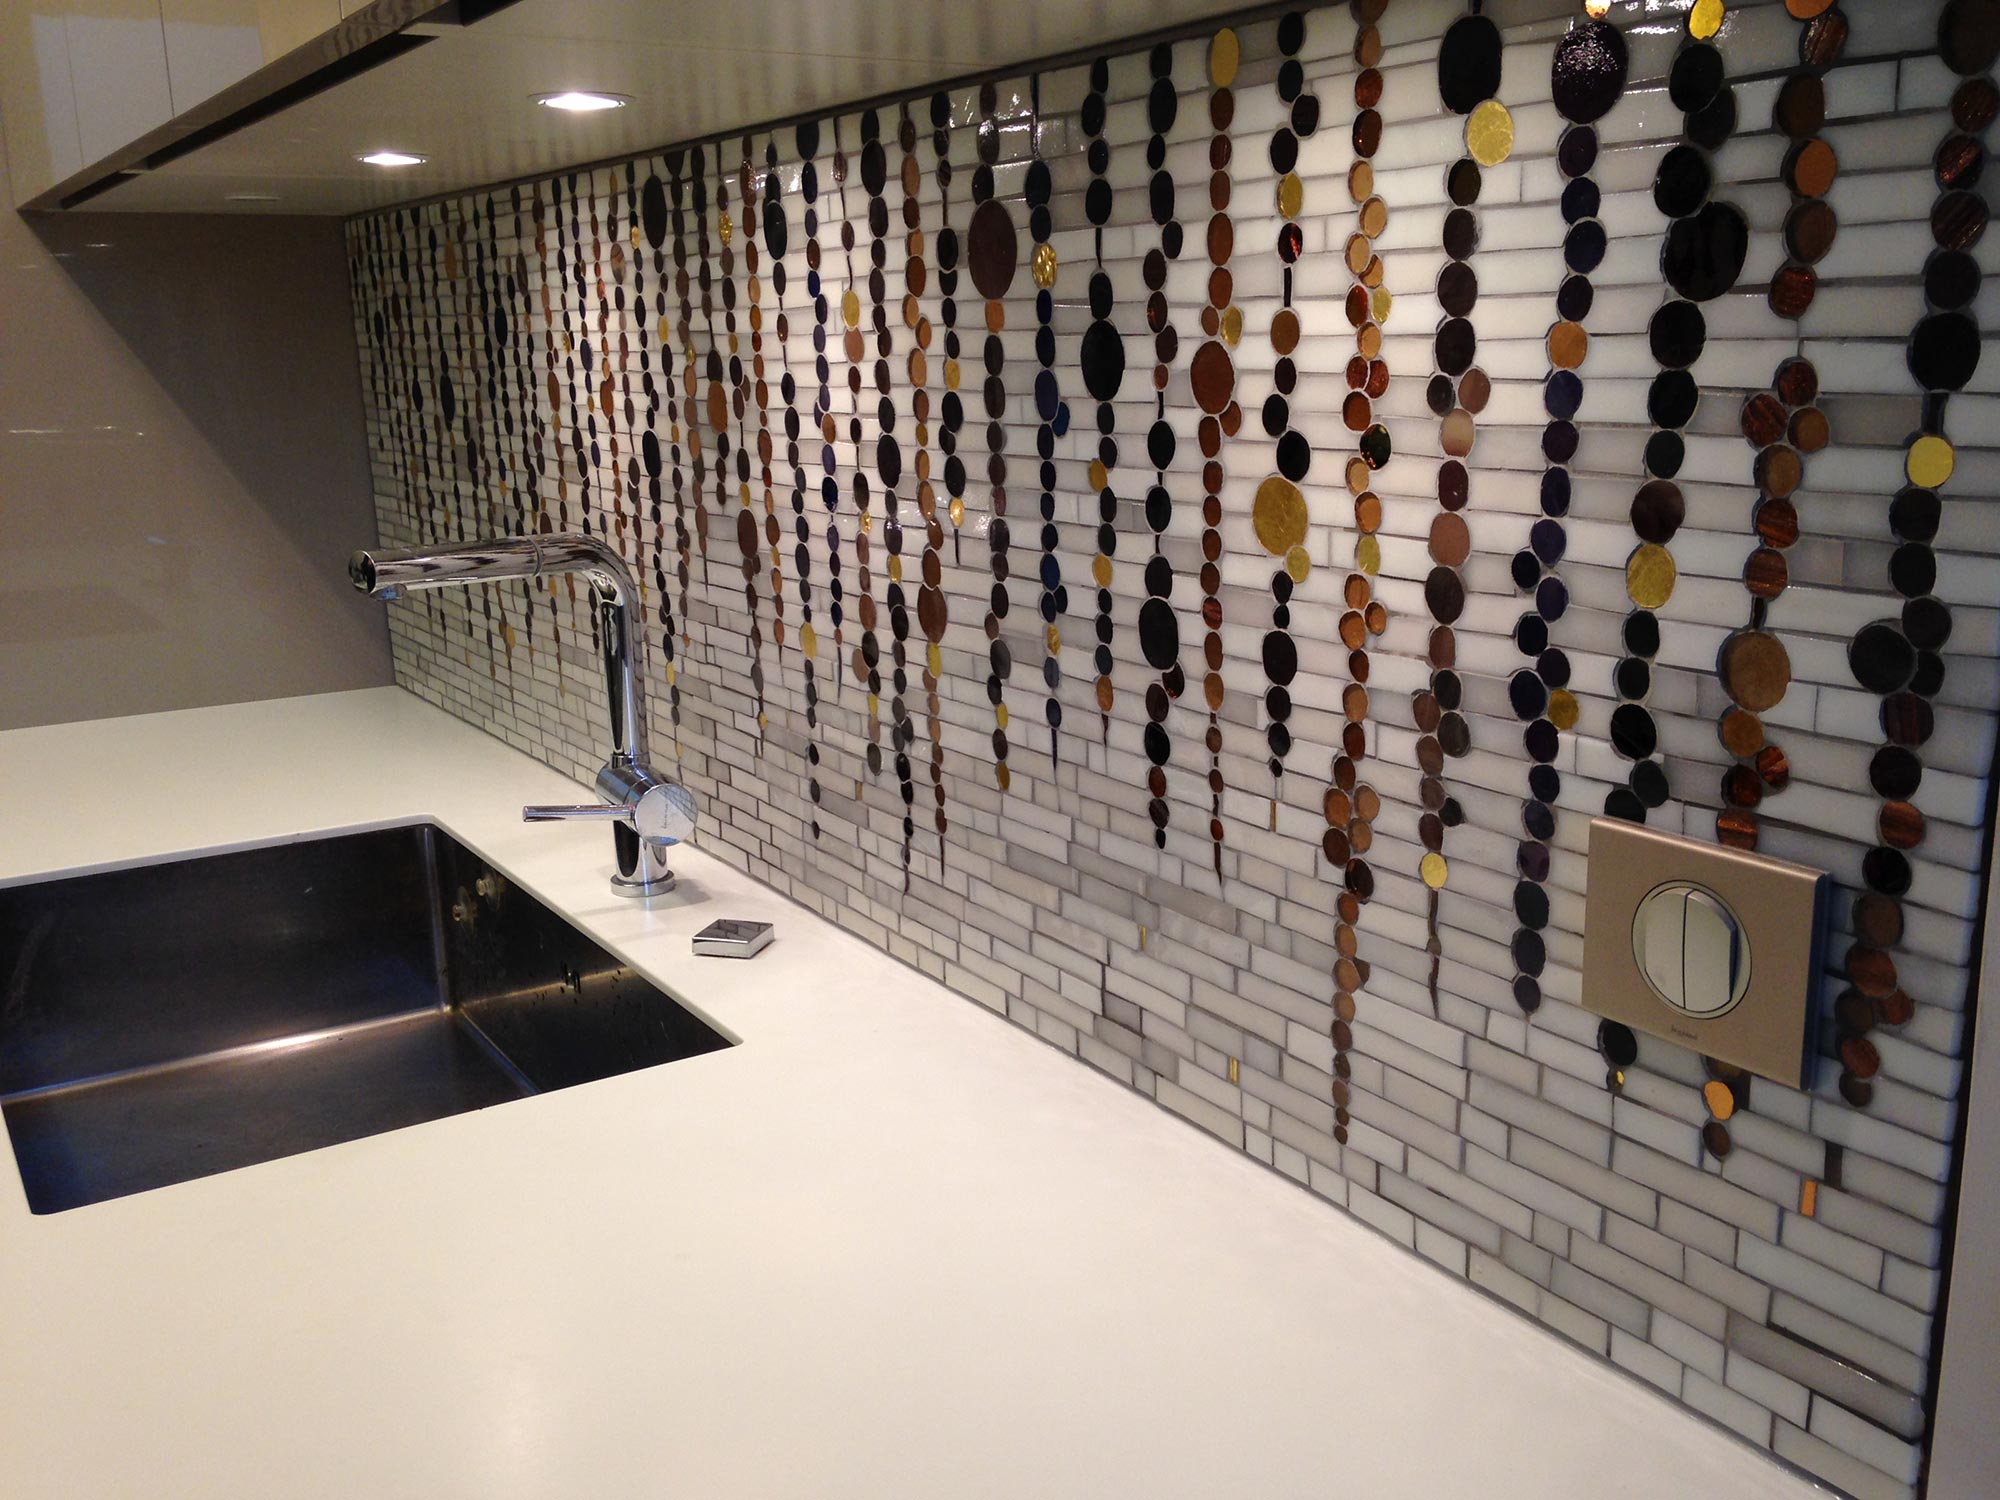 mosaique credence cuisine mosaque pierre pour crdence. Black Bedroom Furniture Sets. Home Design Ideas